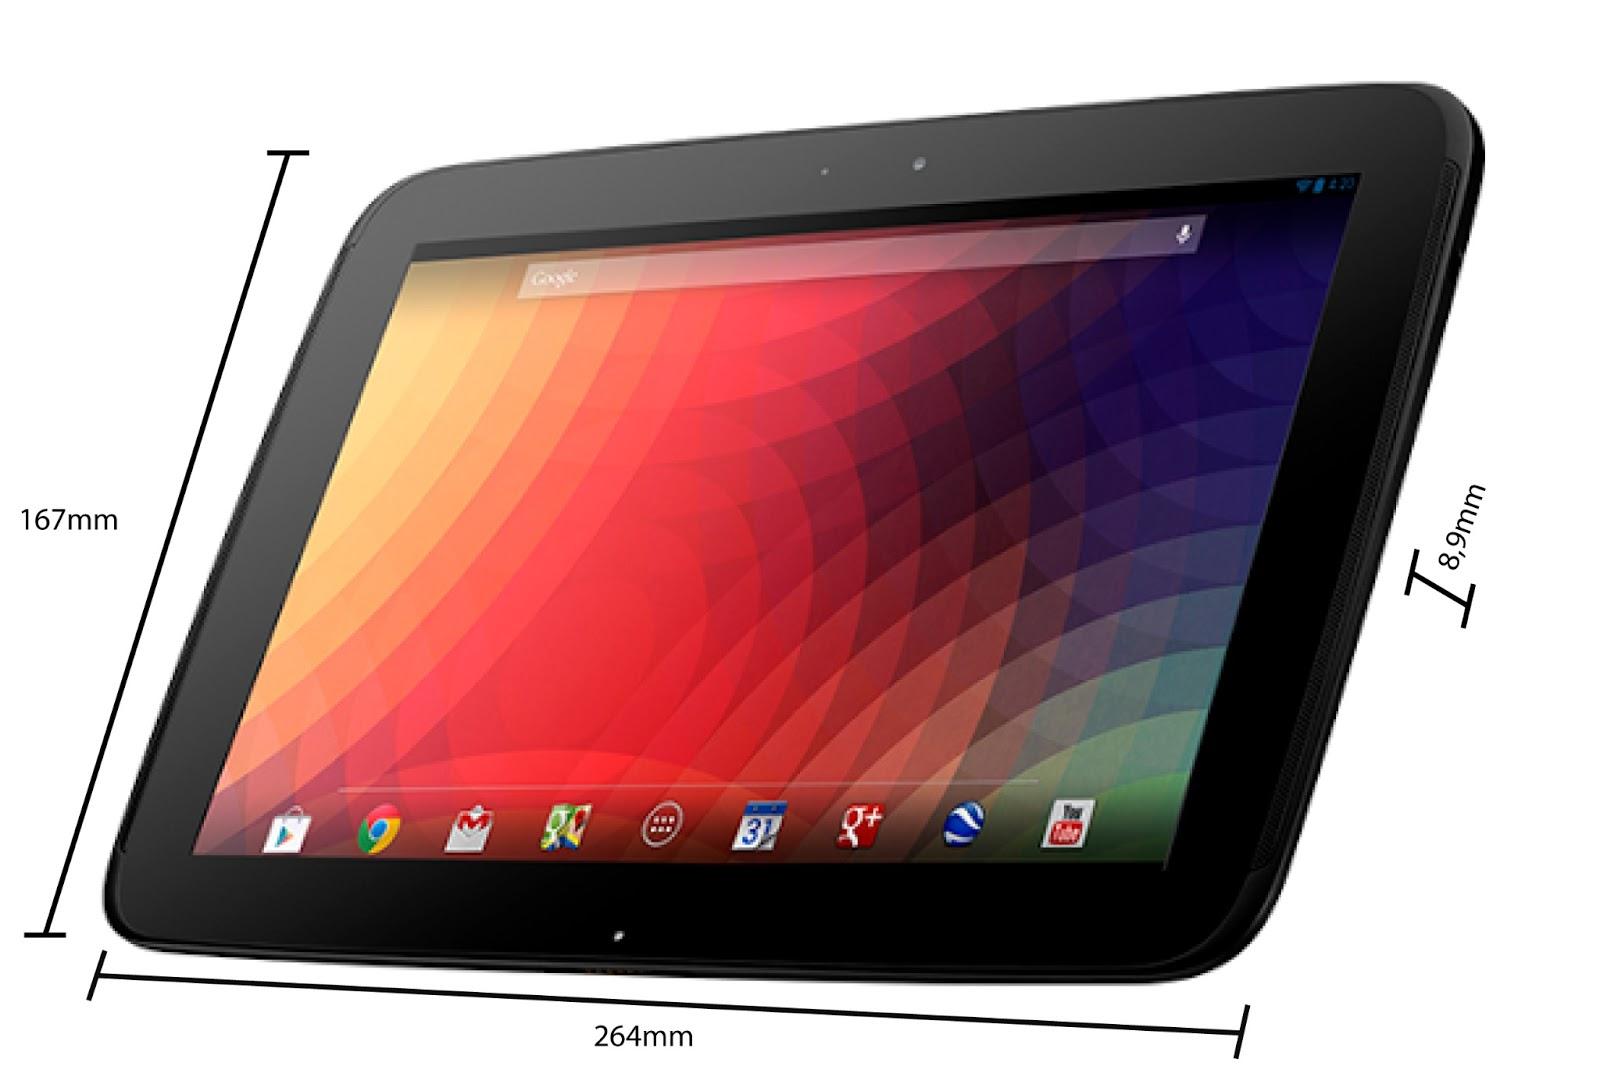 hobby tecnolog a google nexus 10 tablet virtual. Black Bedroom Furniture Sets. Home Design Ideas